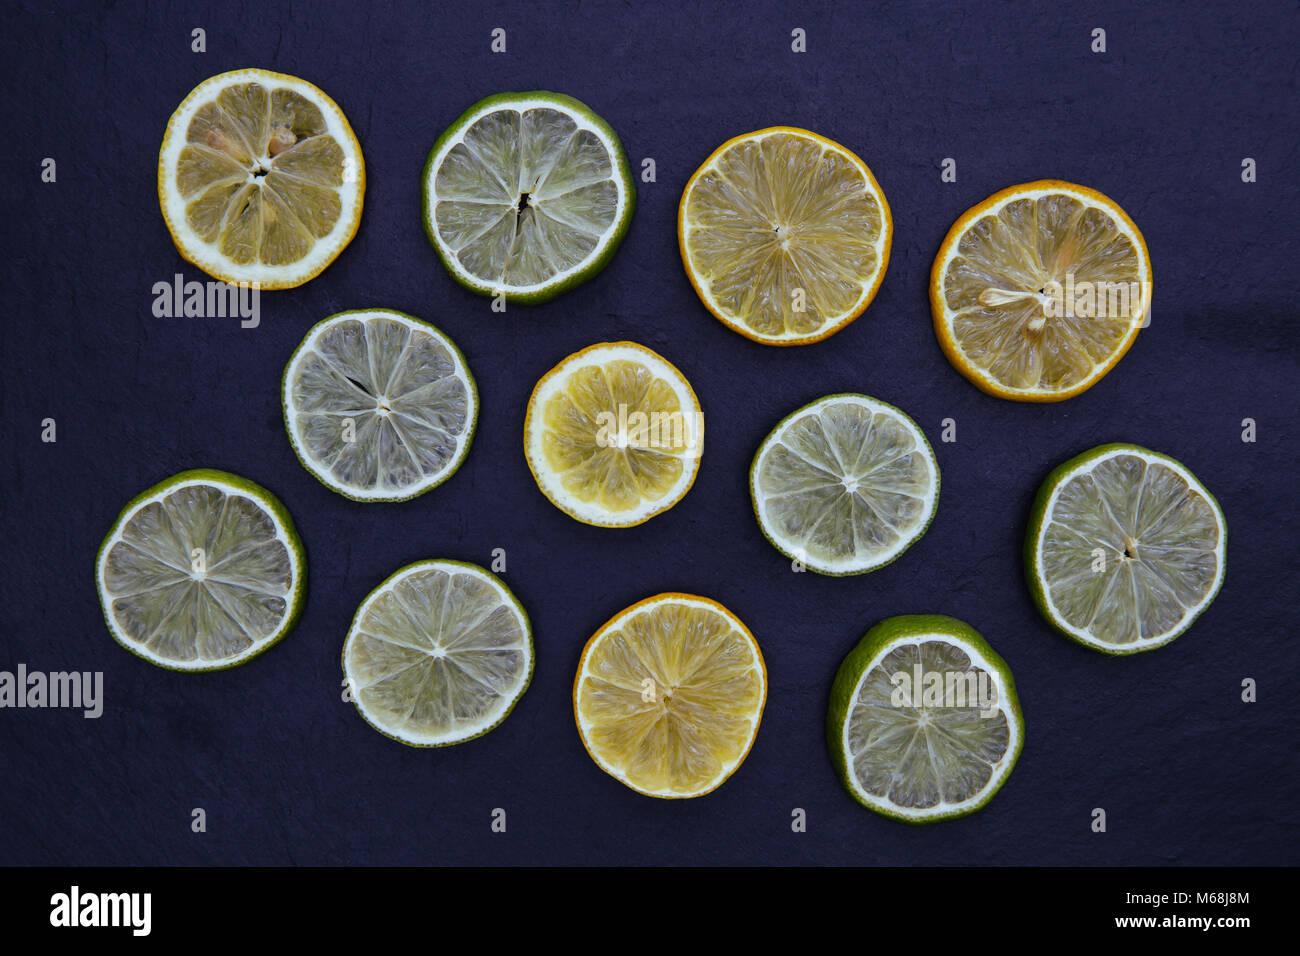 Lemon lime slices food on dark background - Stock Image